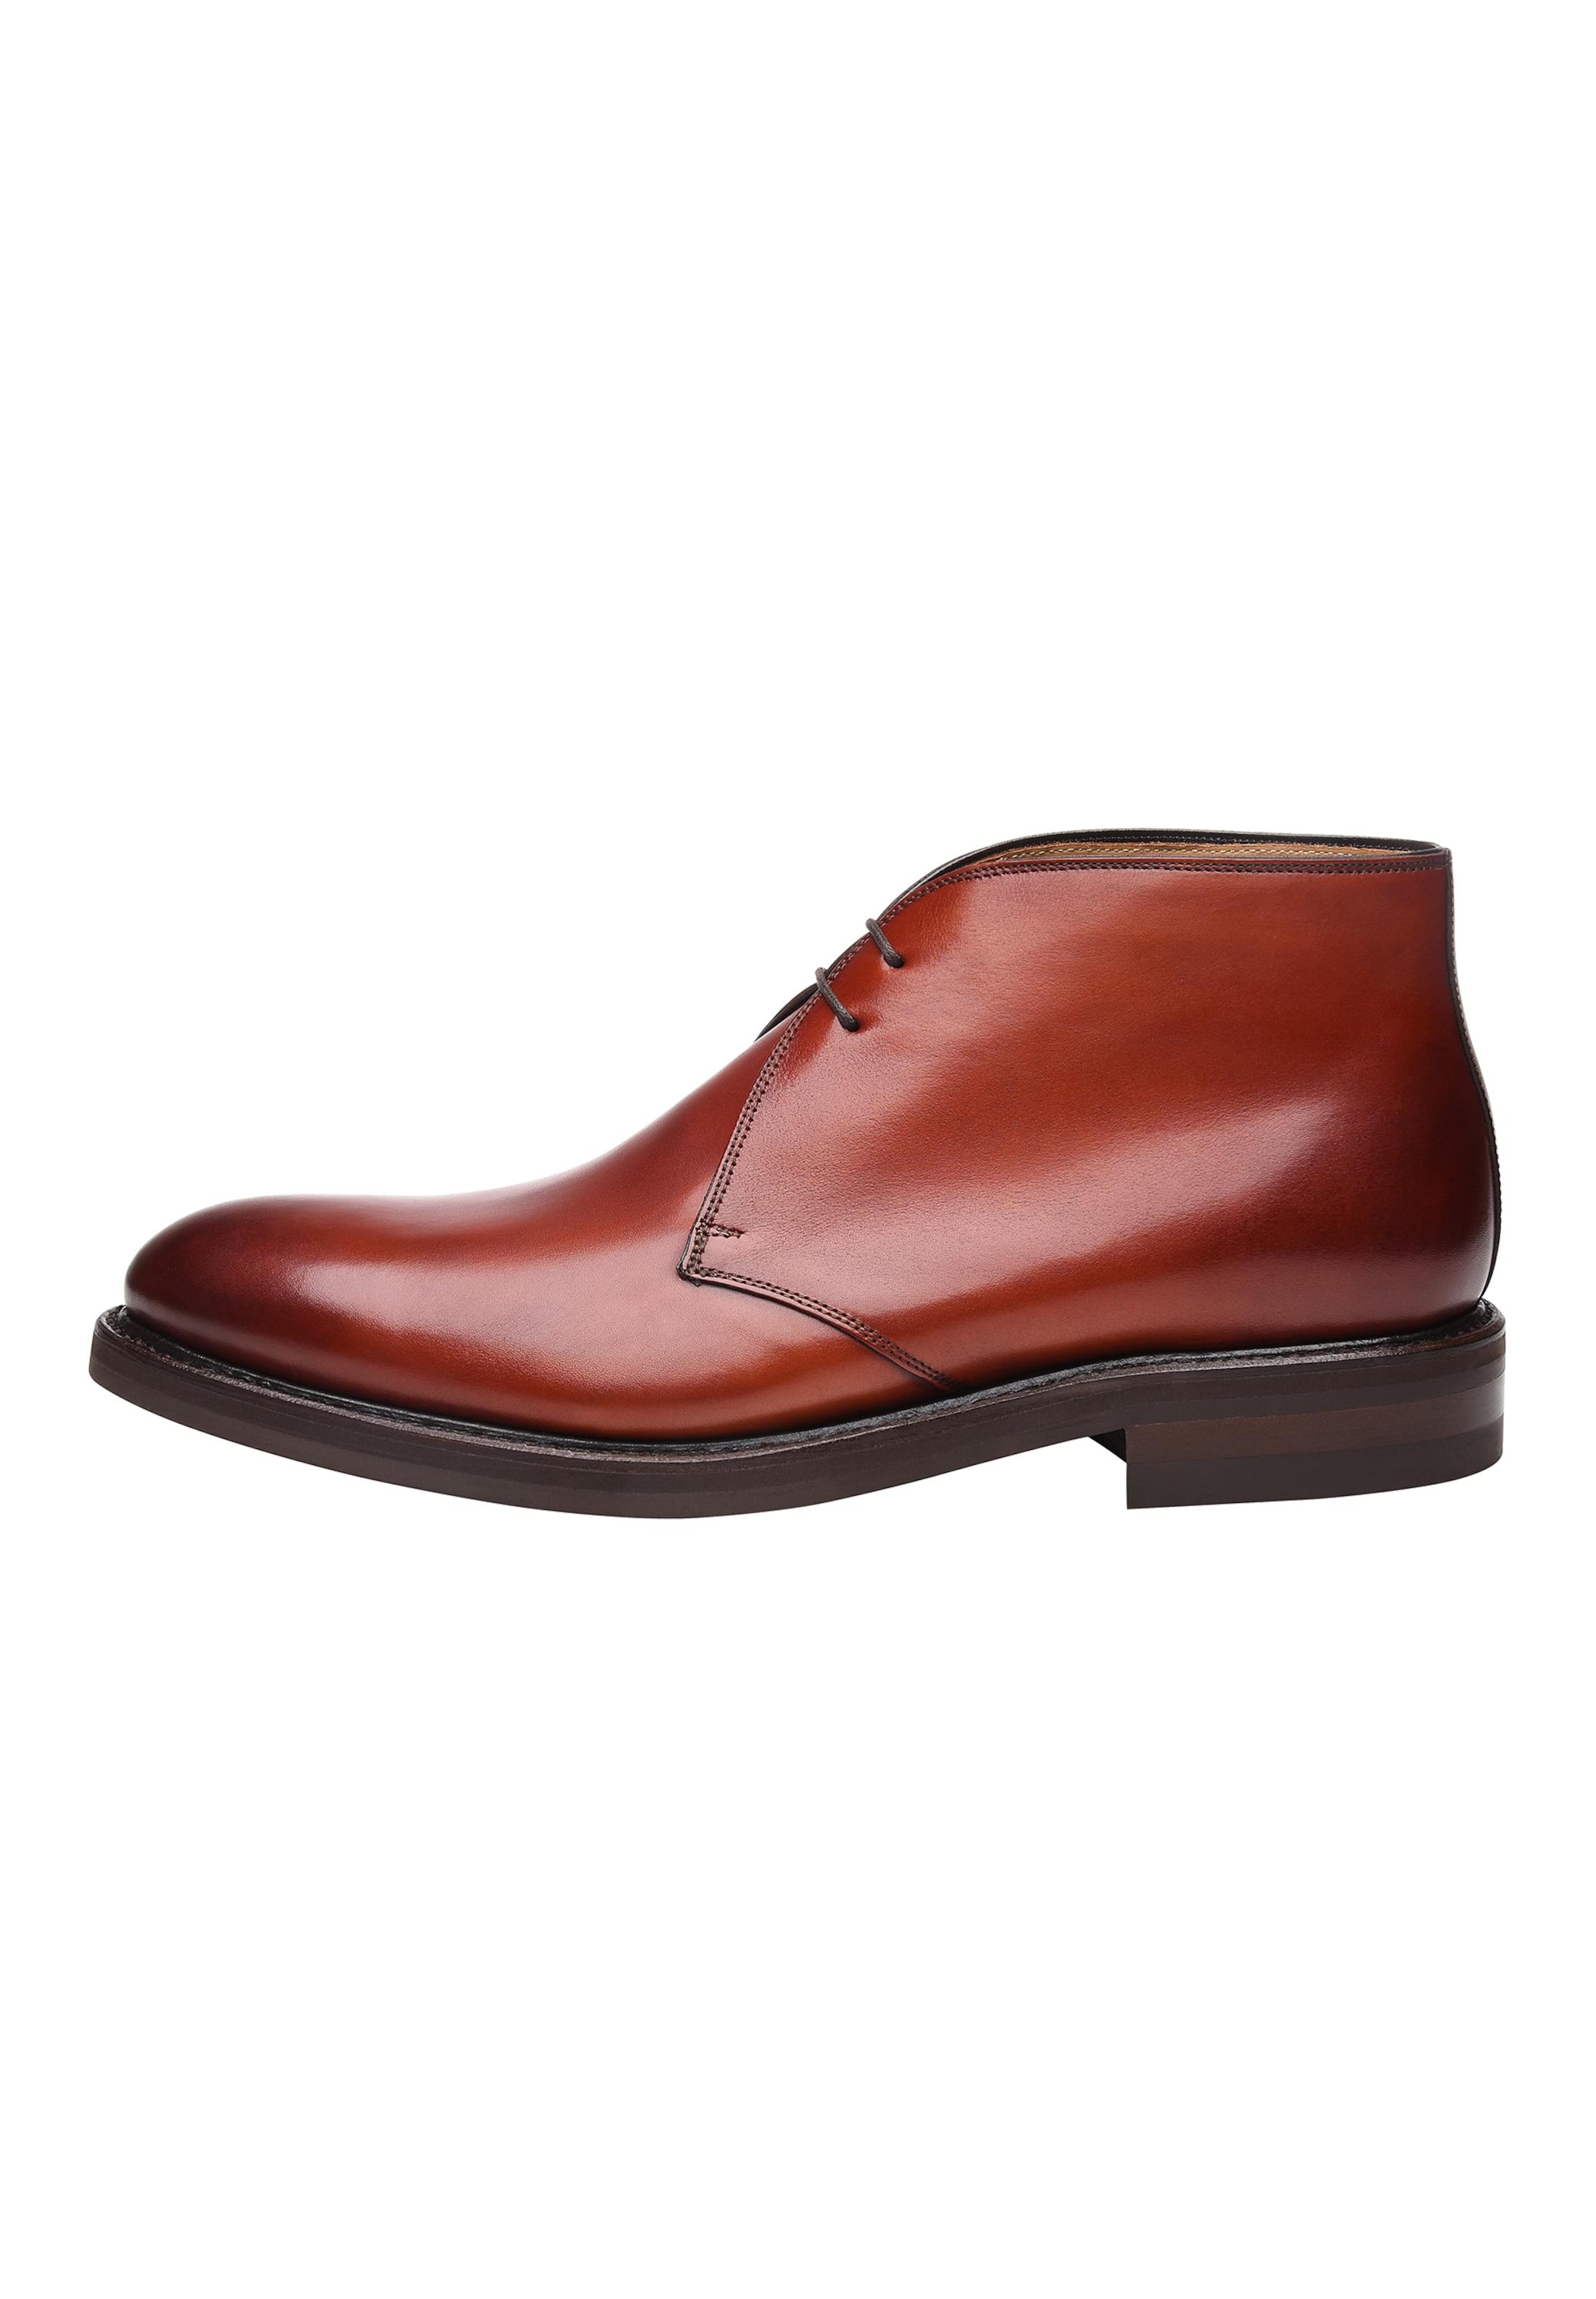 Shoepassion In Chukka Boots 'no6614' Braun ED2W9IH